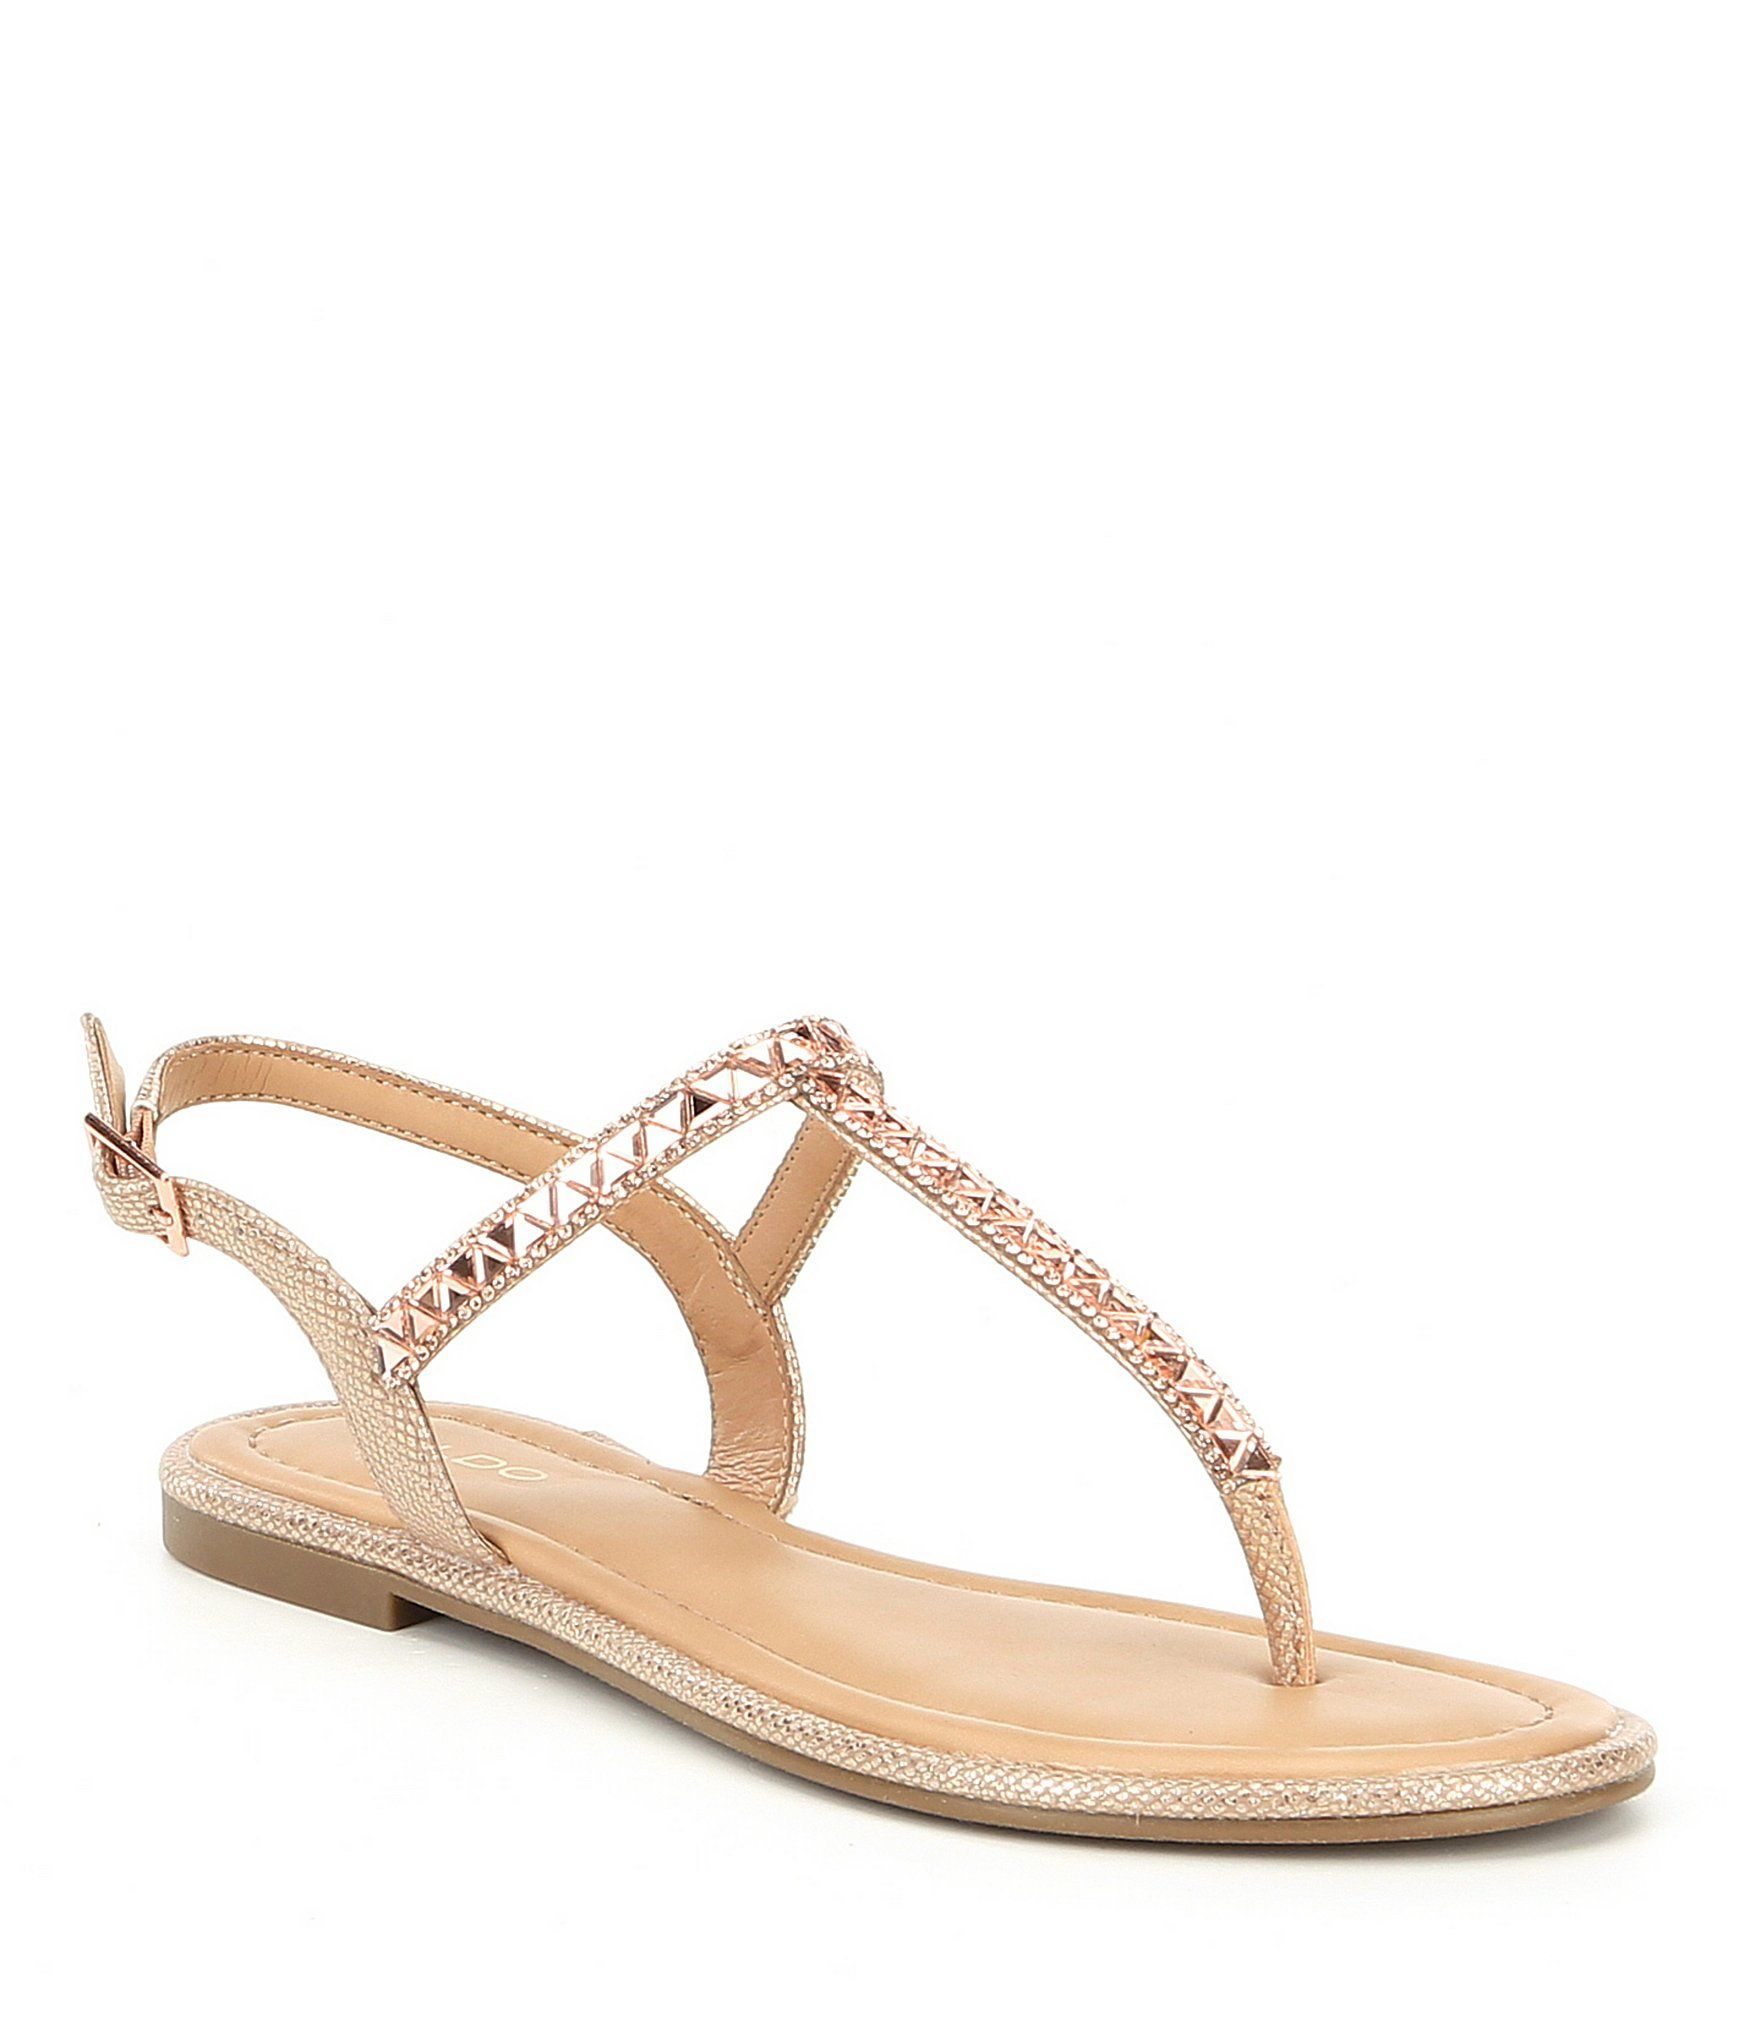 c9a26cb24d13 ALDO Sheeny Embellished Thong Sandals  Dillards